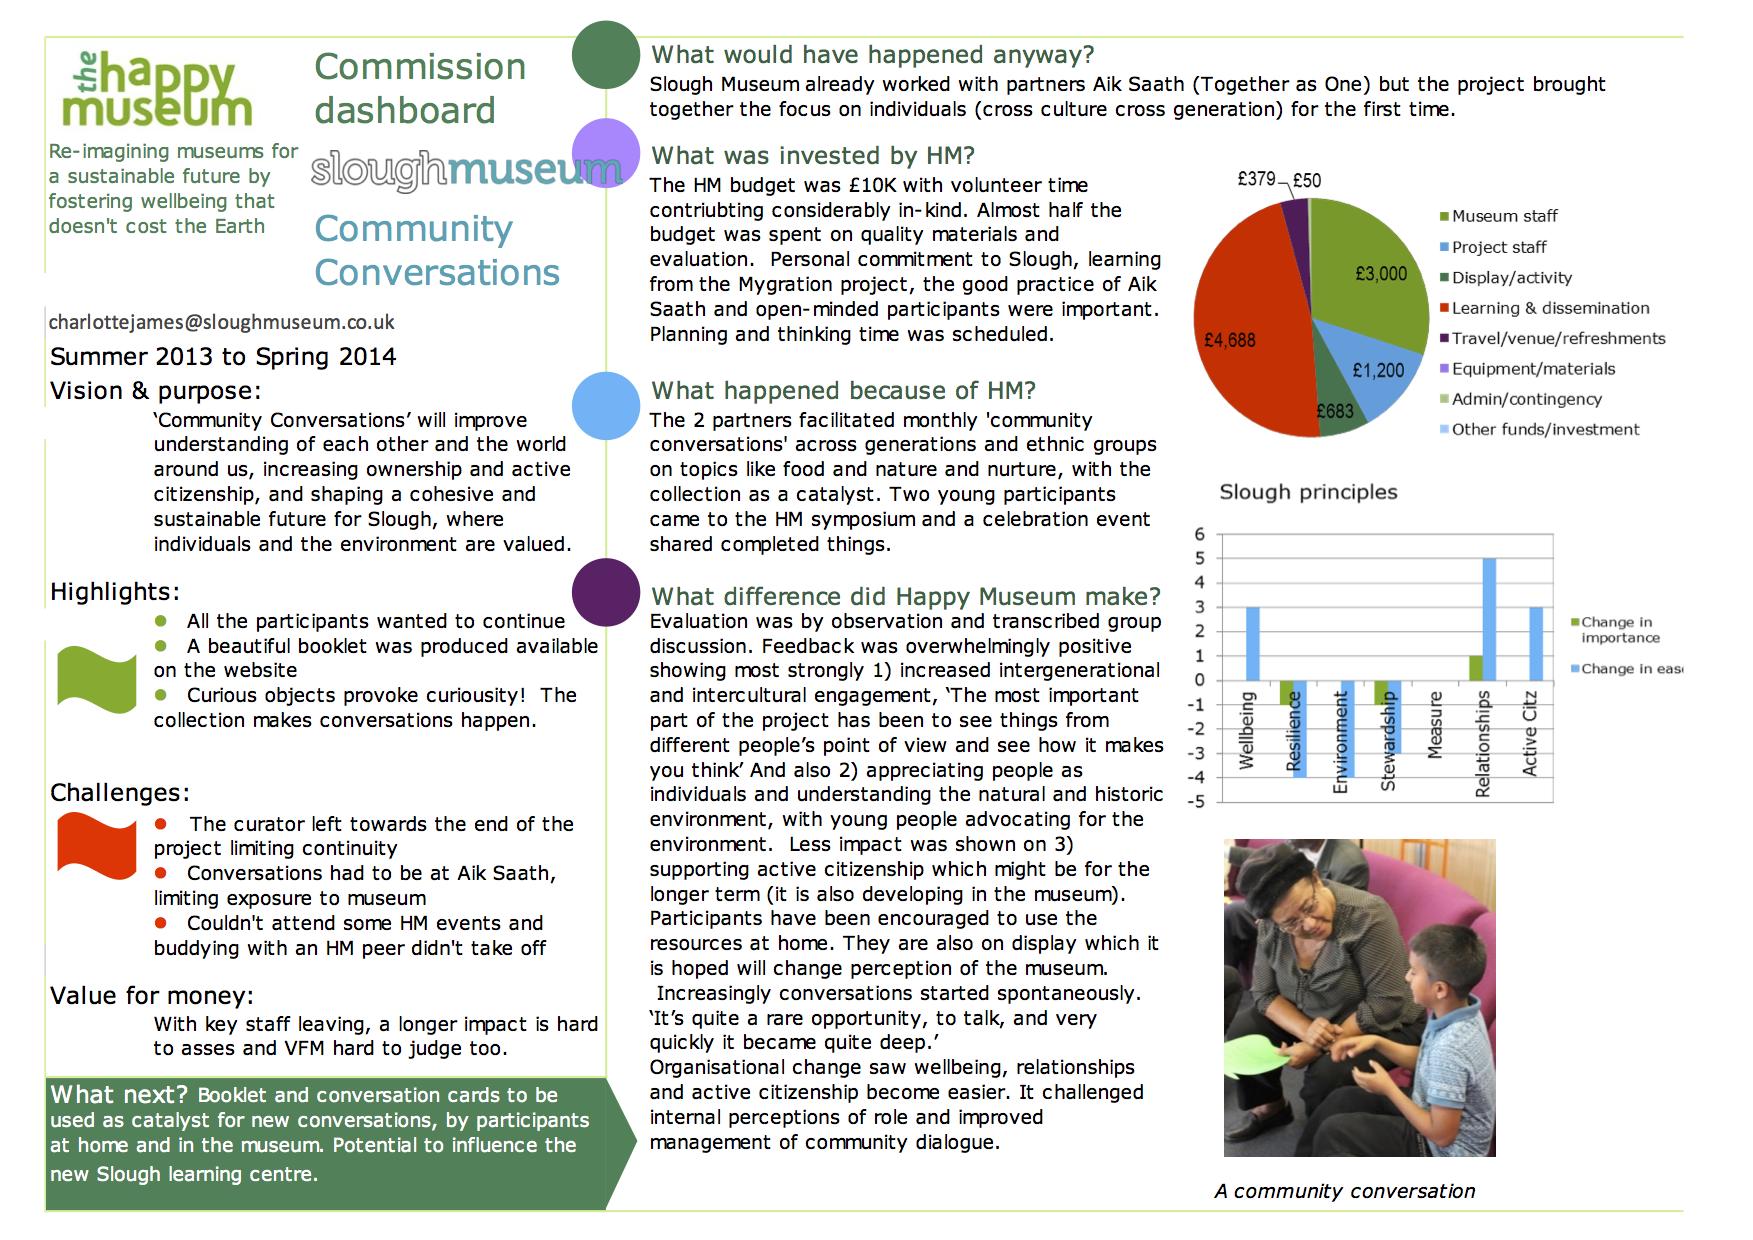 Slough Community Conversations dashboard